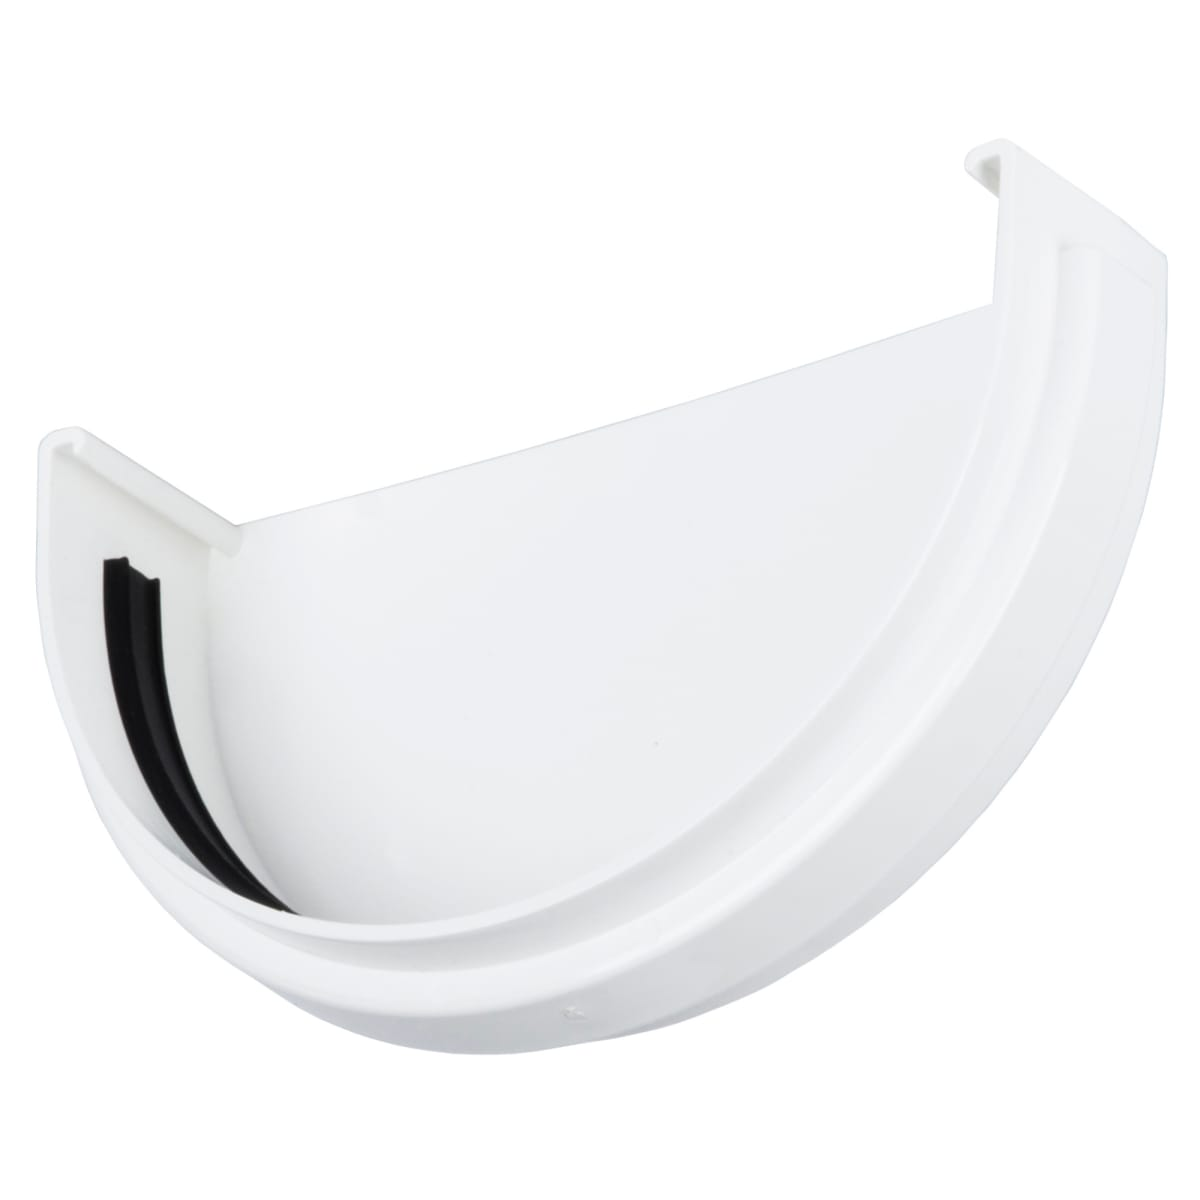 Заглушка Dacha 120 мм цвет белый